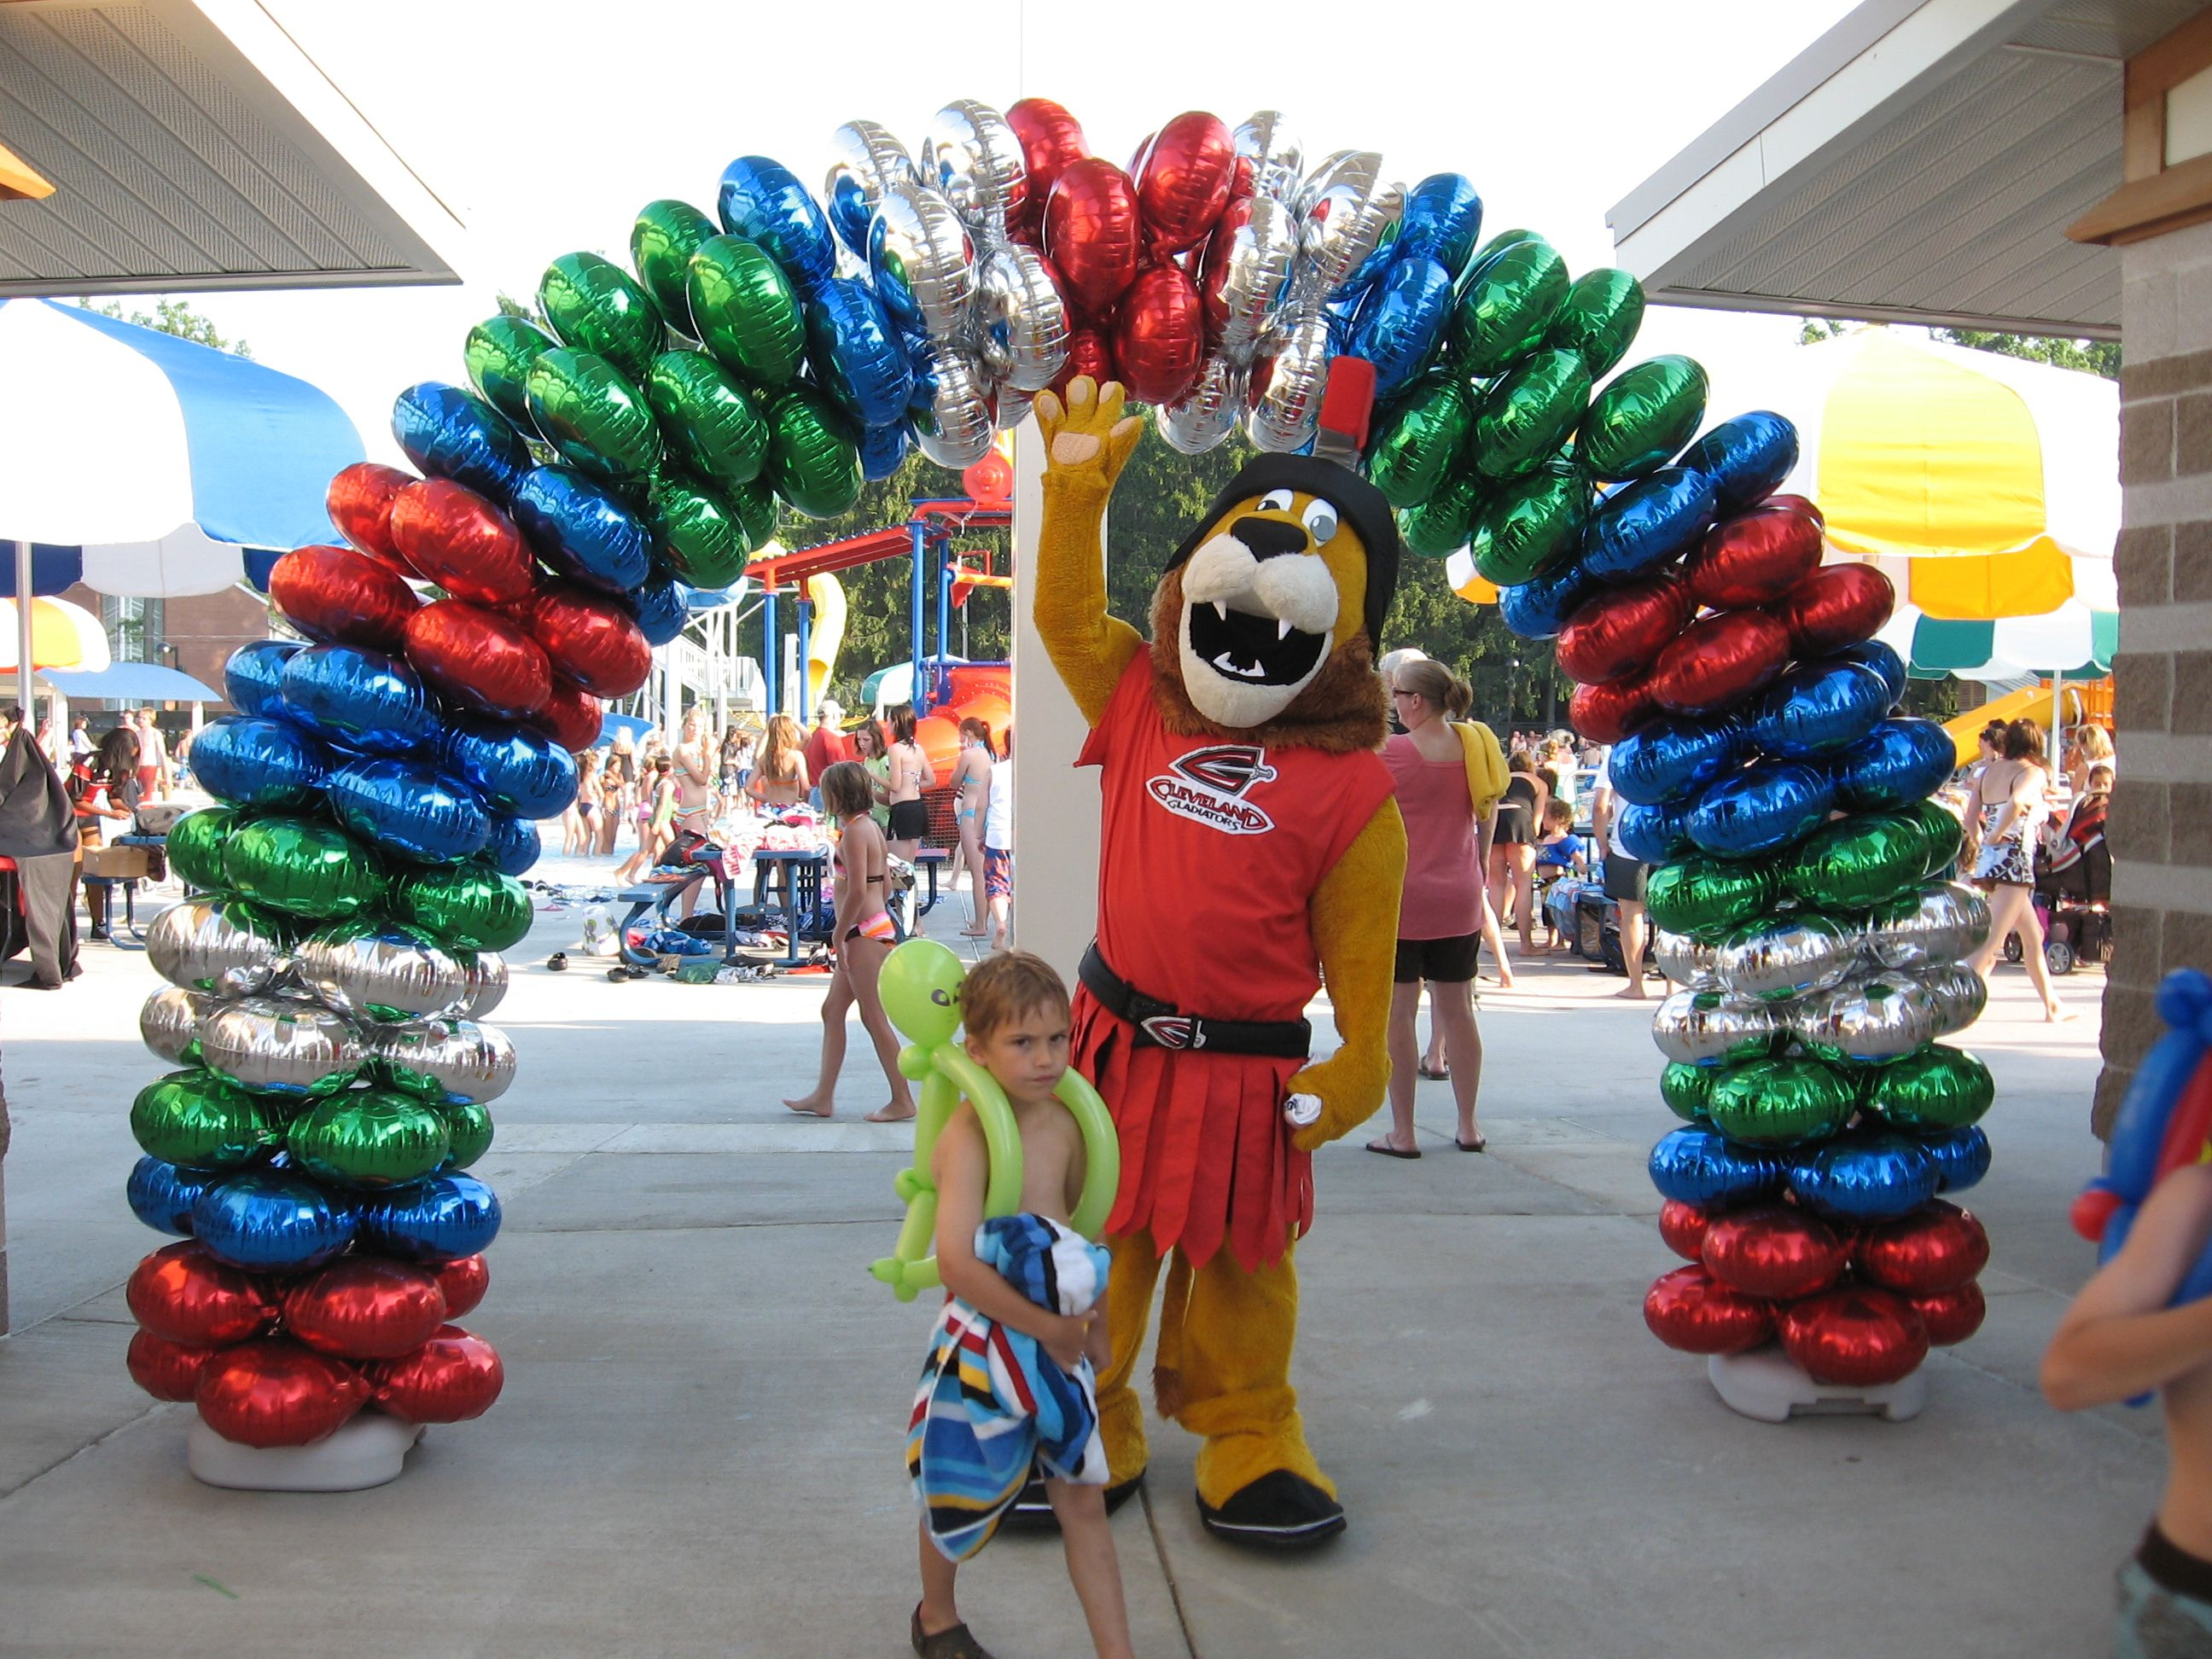 balloons add more fun